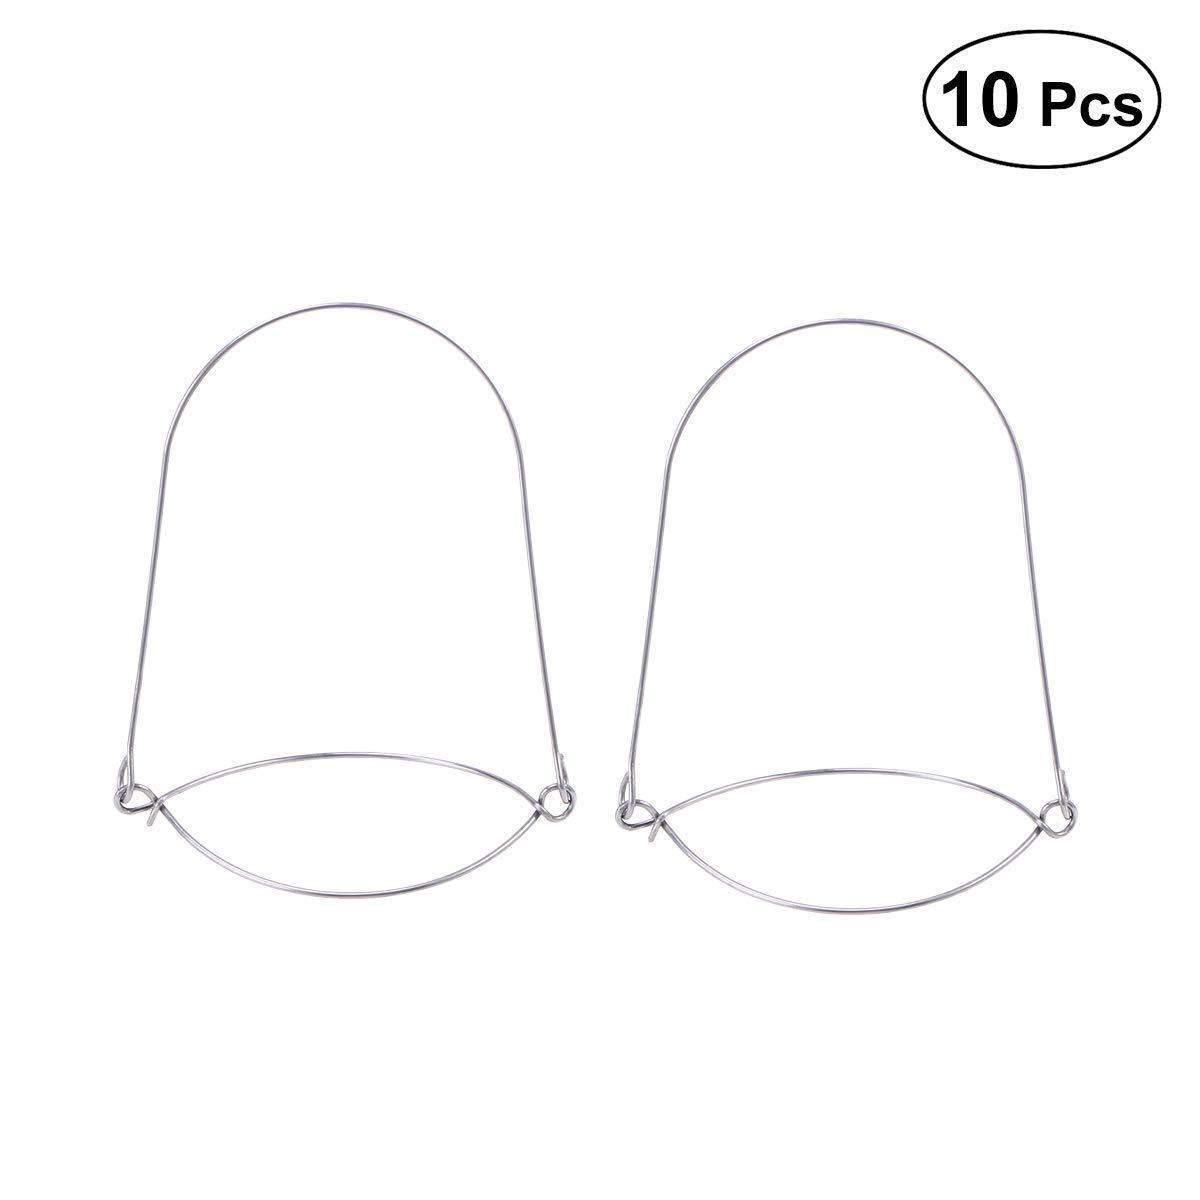 BESTONZON 10PCS Stainless Steel Wire Handles Mason Jar Hangers for Regular Mouth Canning Jars,Solar Mason Jar Lights Lanterns (Suit for 70MM Mason Jars)